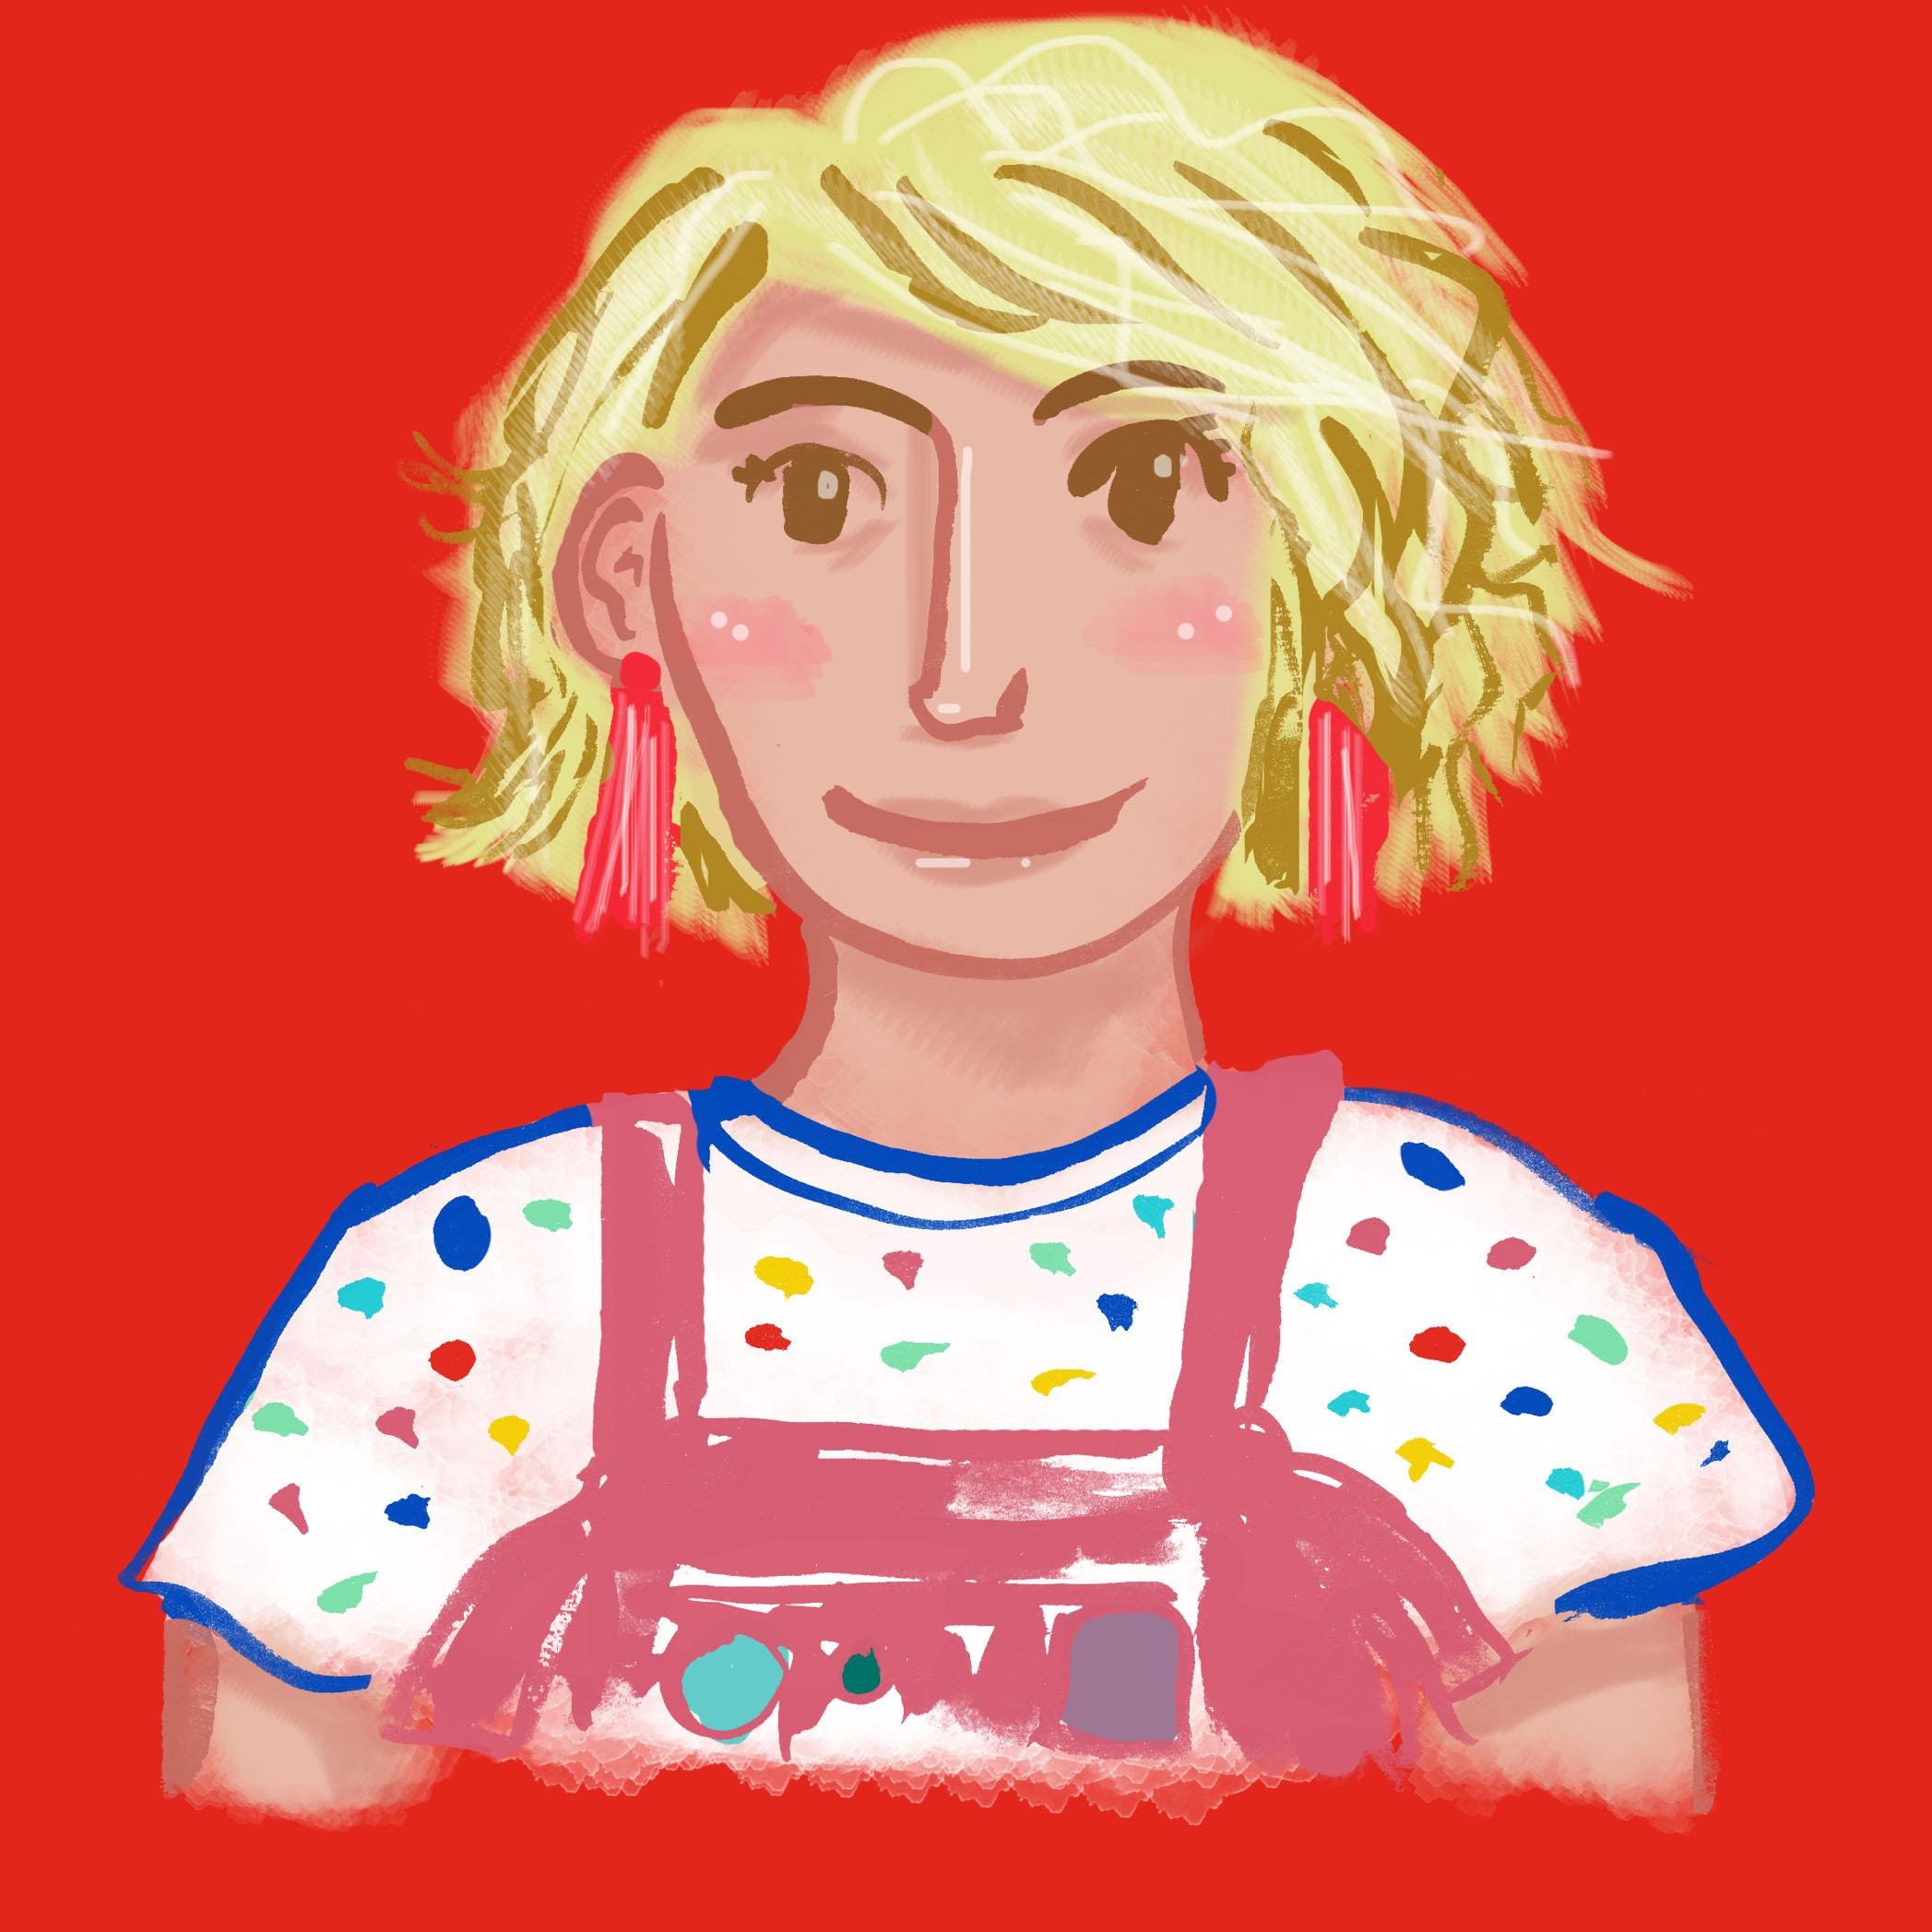 Sophie Heywood Illustration